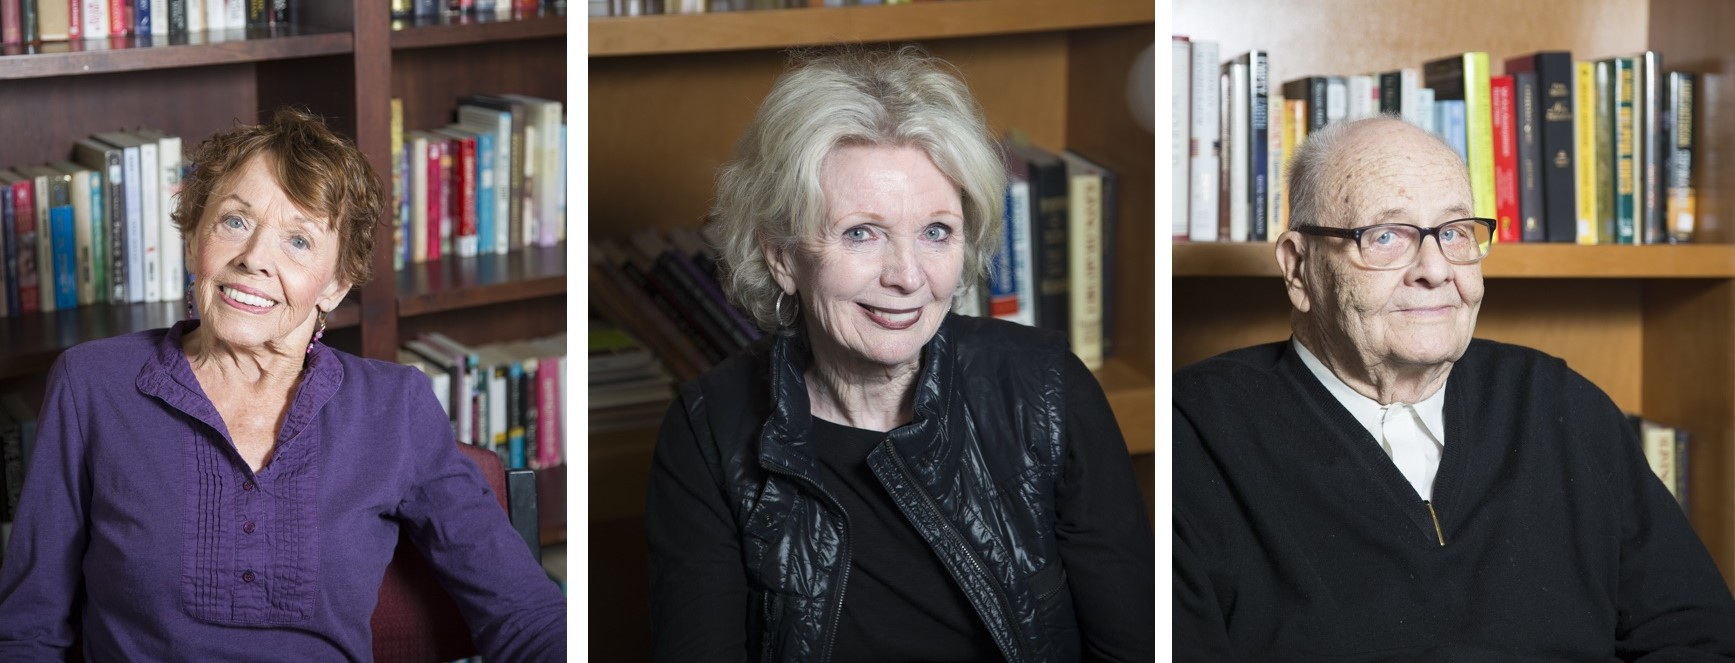 Kit Harper, Jean T. Ritchie, Lucius Foster